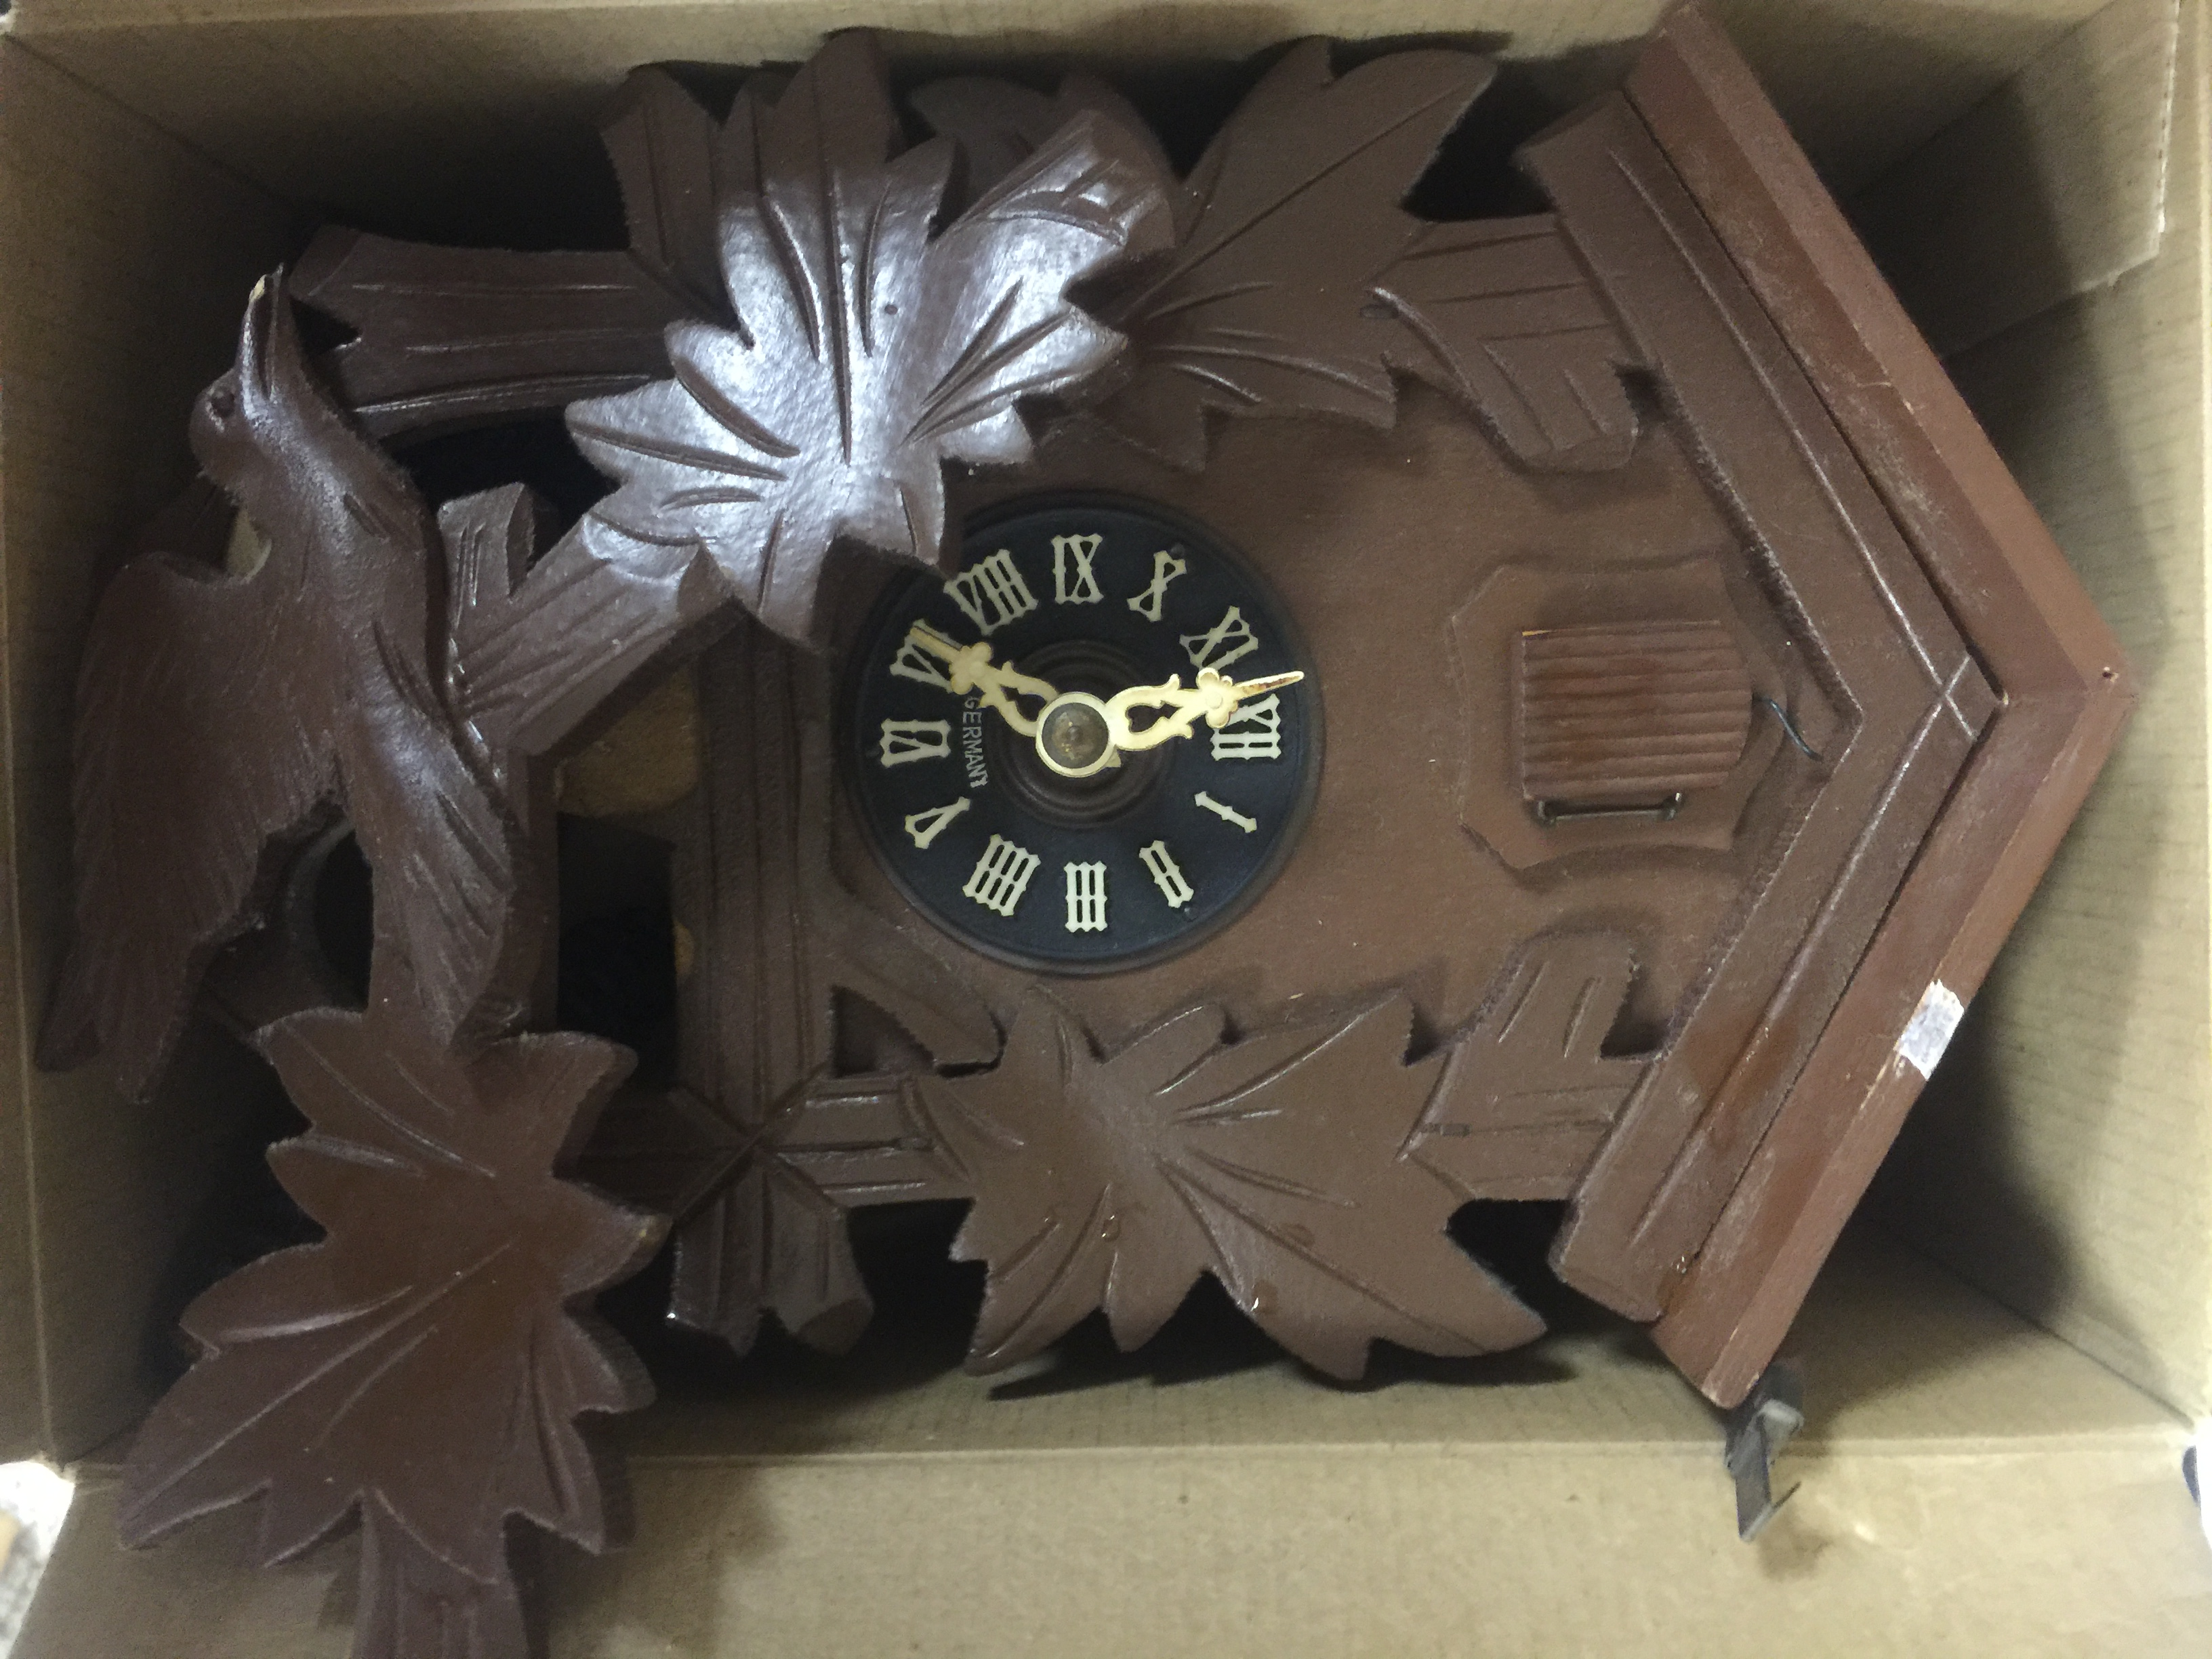 coo-coo clock